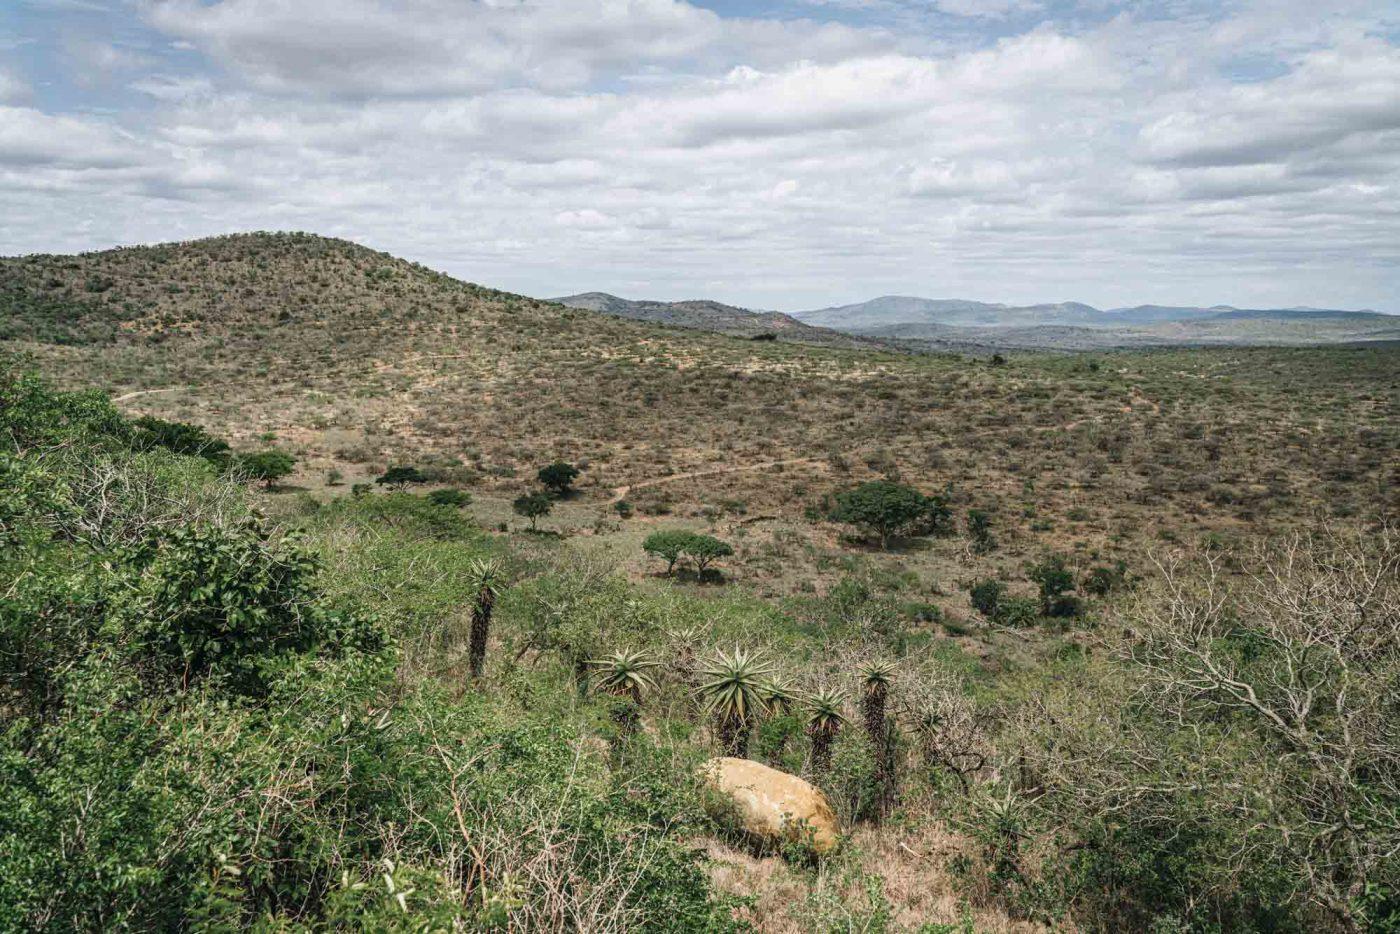 Sweeping views of Hluhluwe iMfolozi National Park